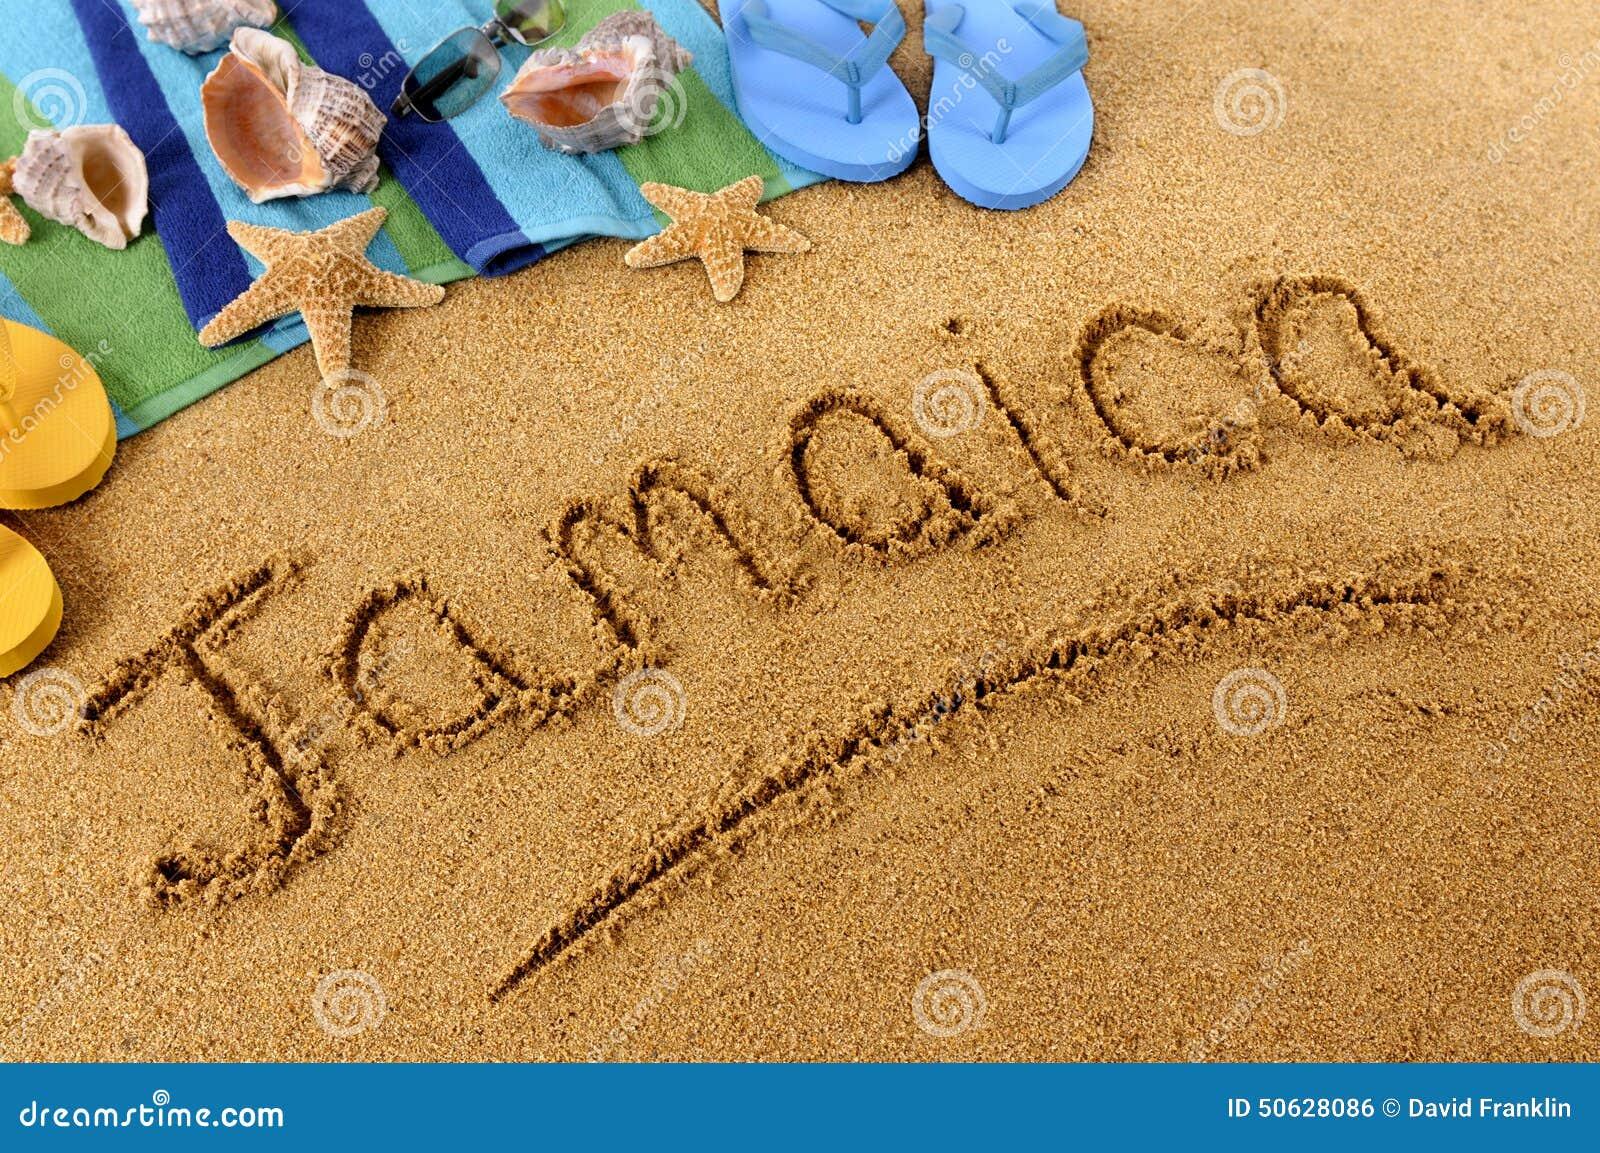 jamaica beach sand word writing stock photo image 50628086 seashell clipart freeware black and white seashell clipart black and white